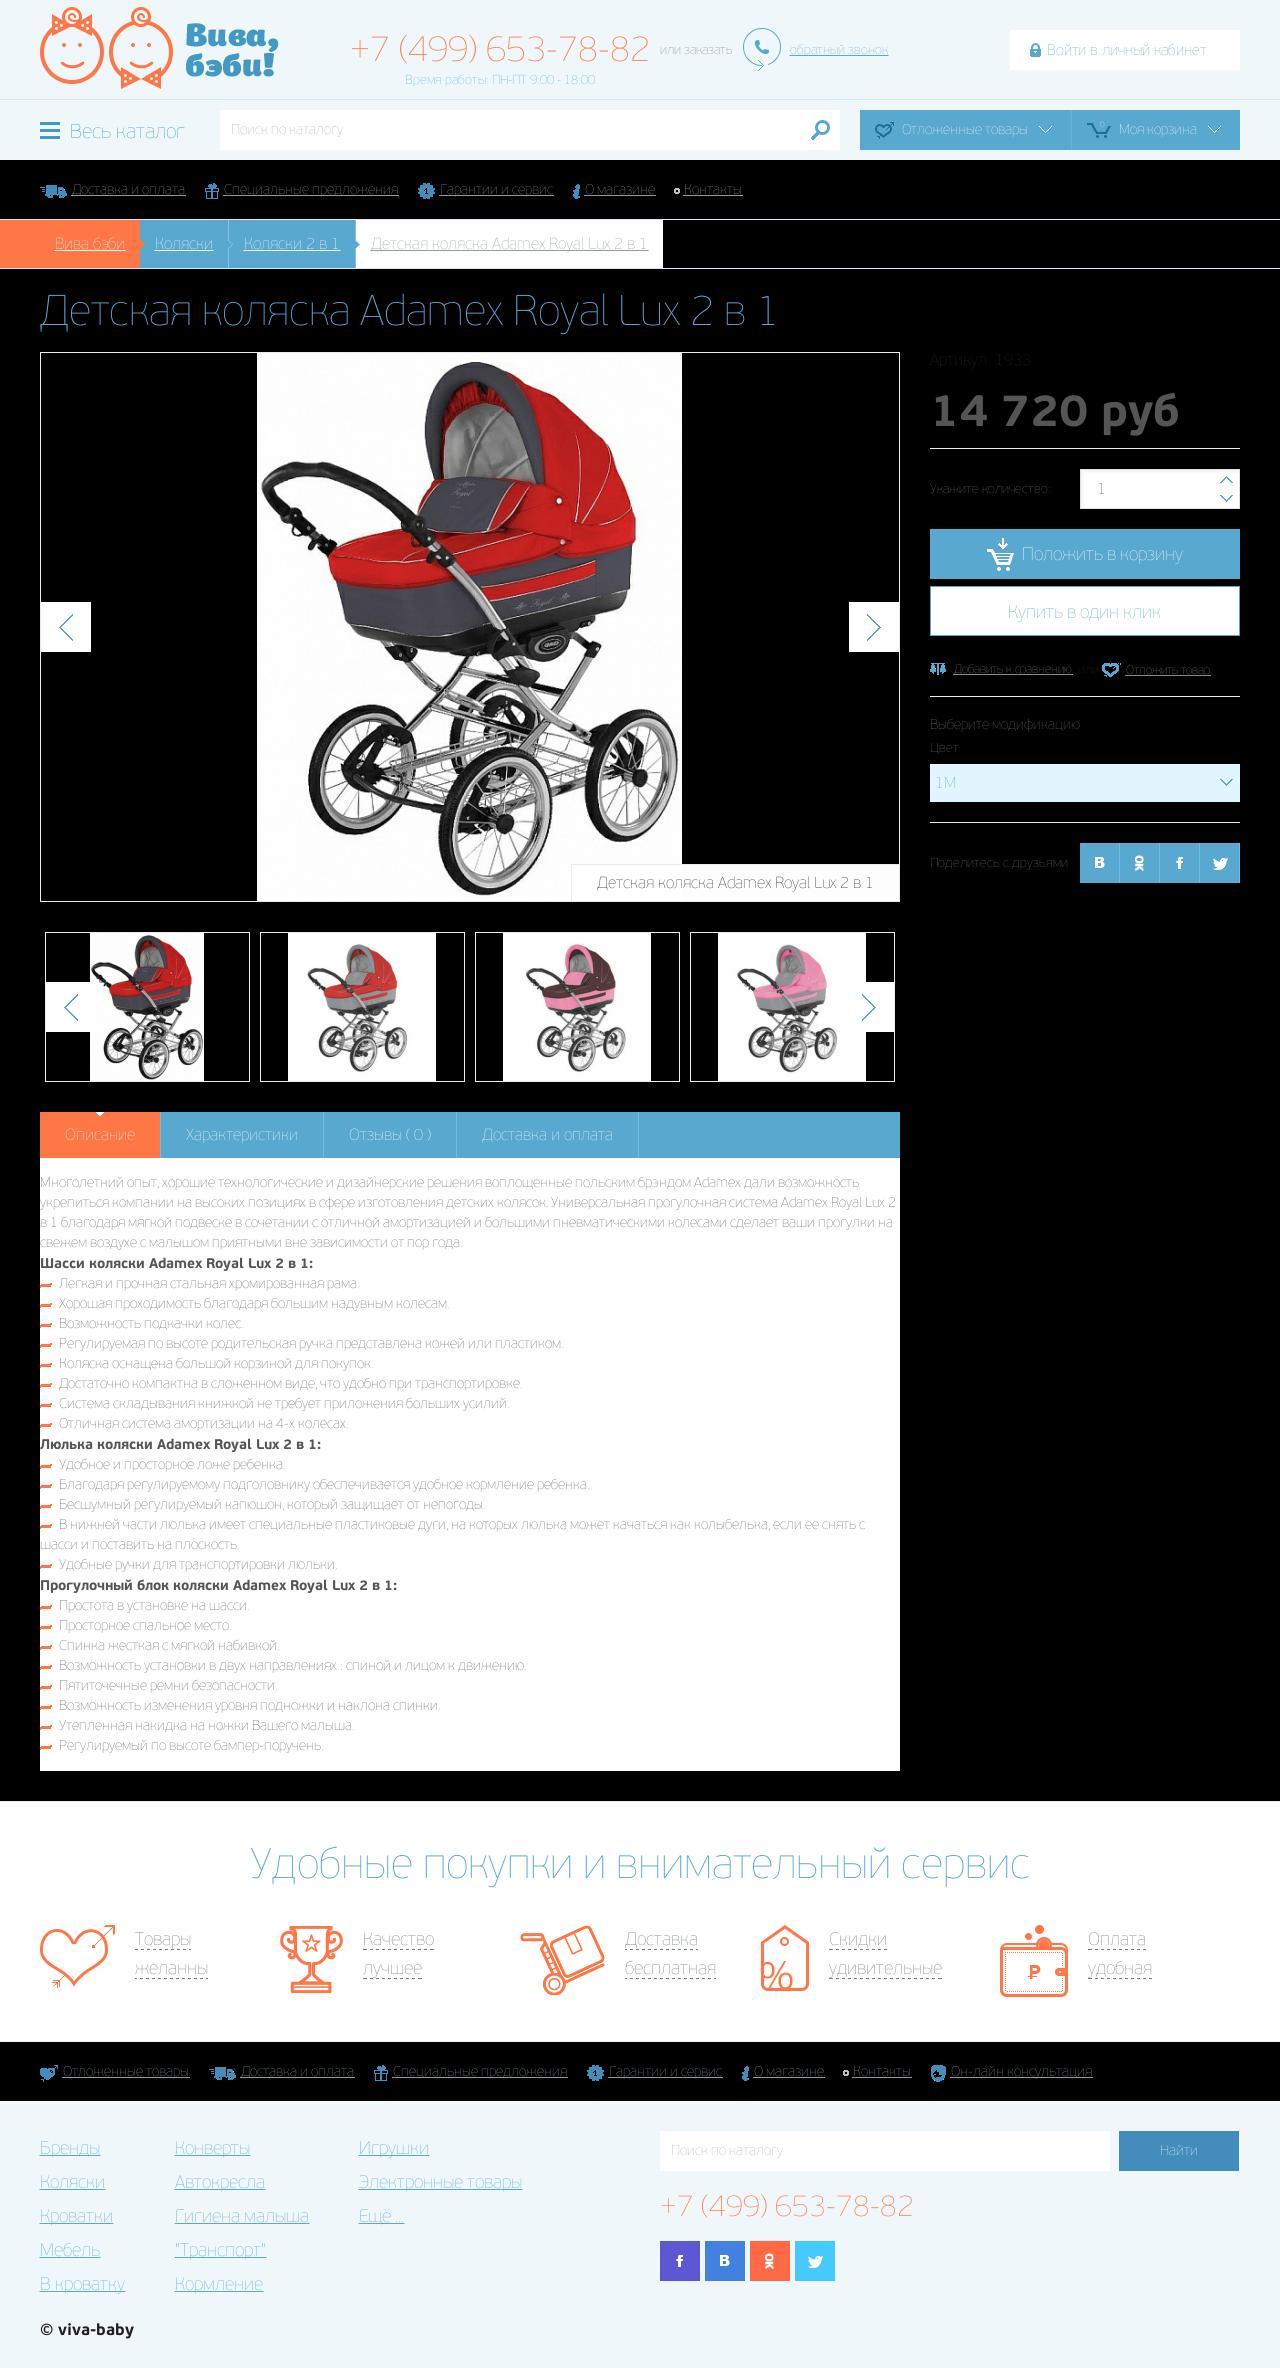 Дизайн интернет-магазина viva-baby